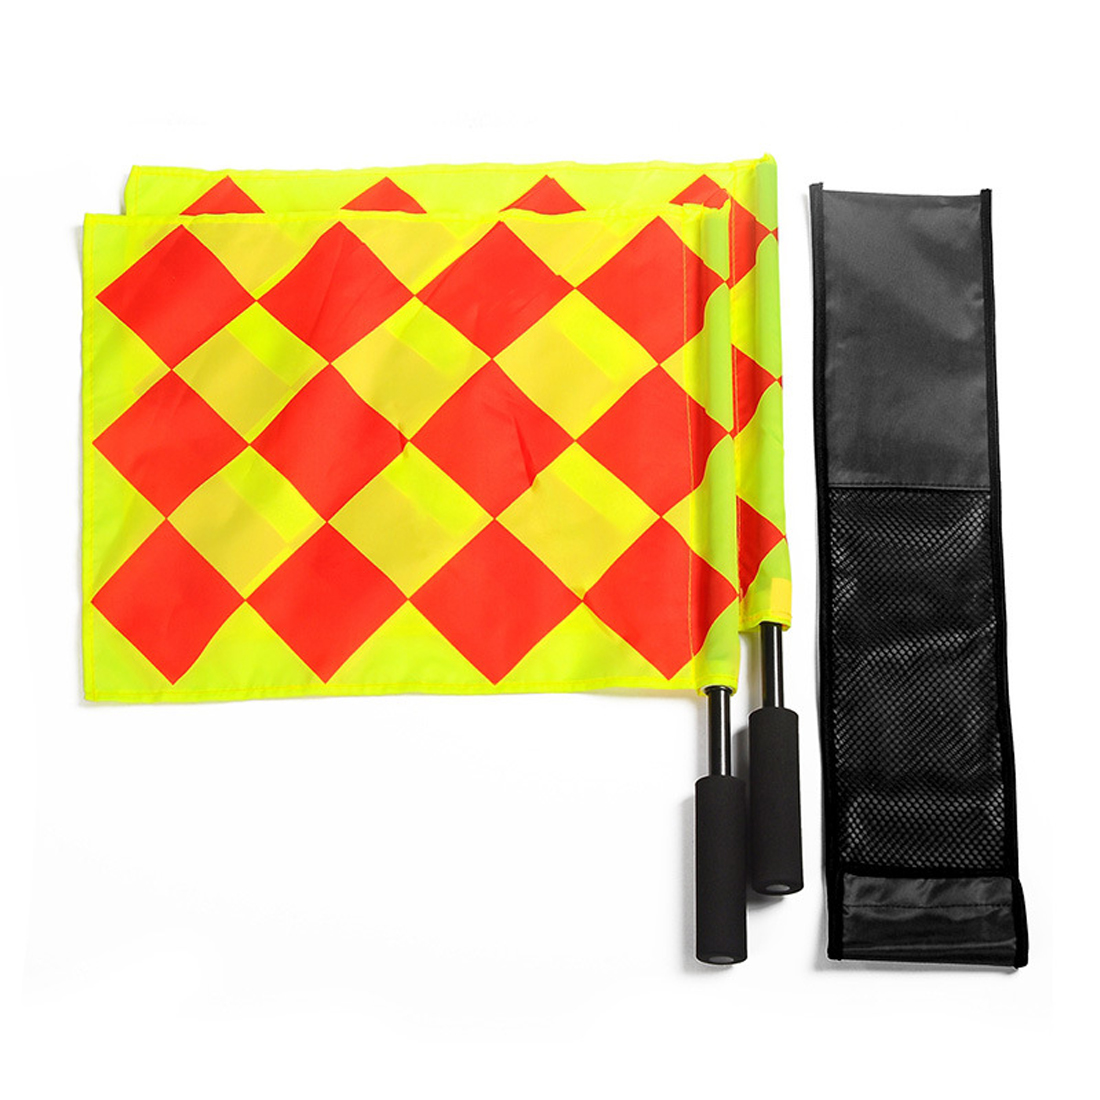 2Pcs Soccer Referee Flag Football Judge Sideline Fair Play Use Sports Match Football Linesman Flags Referee Equipment